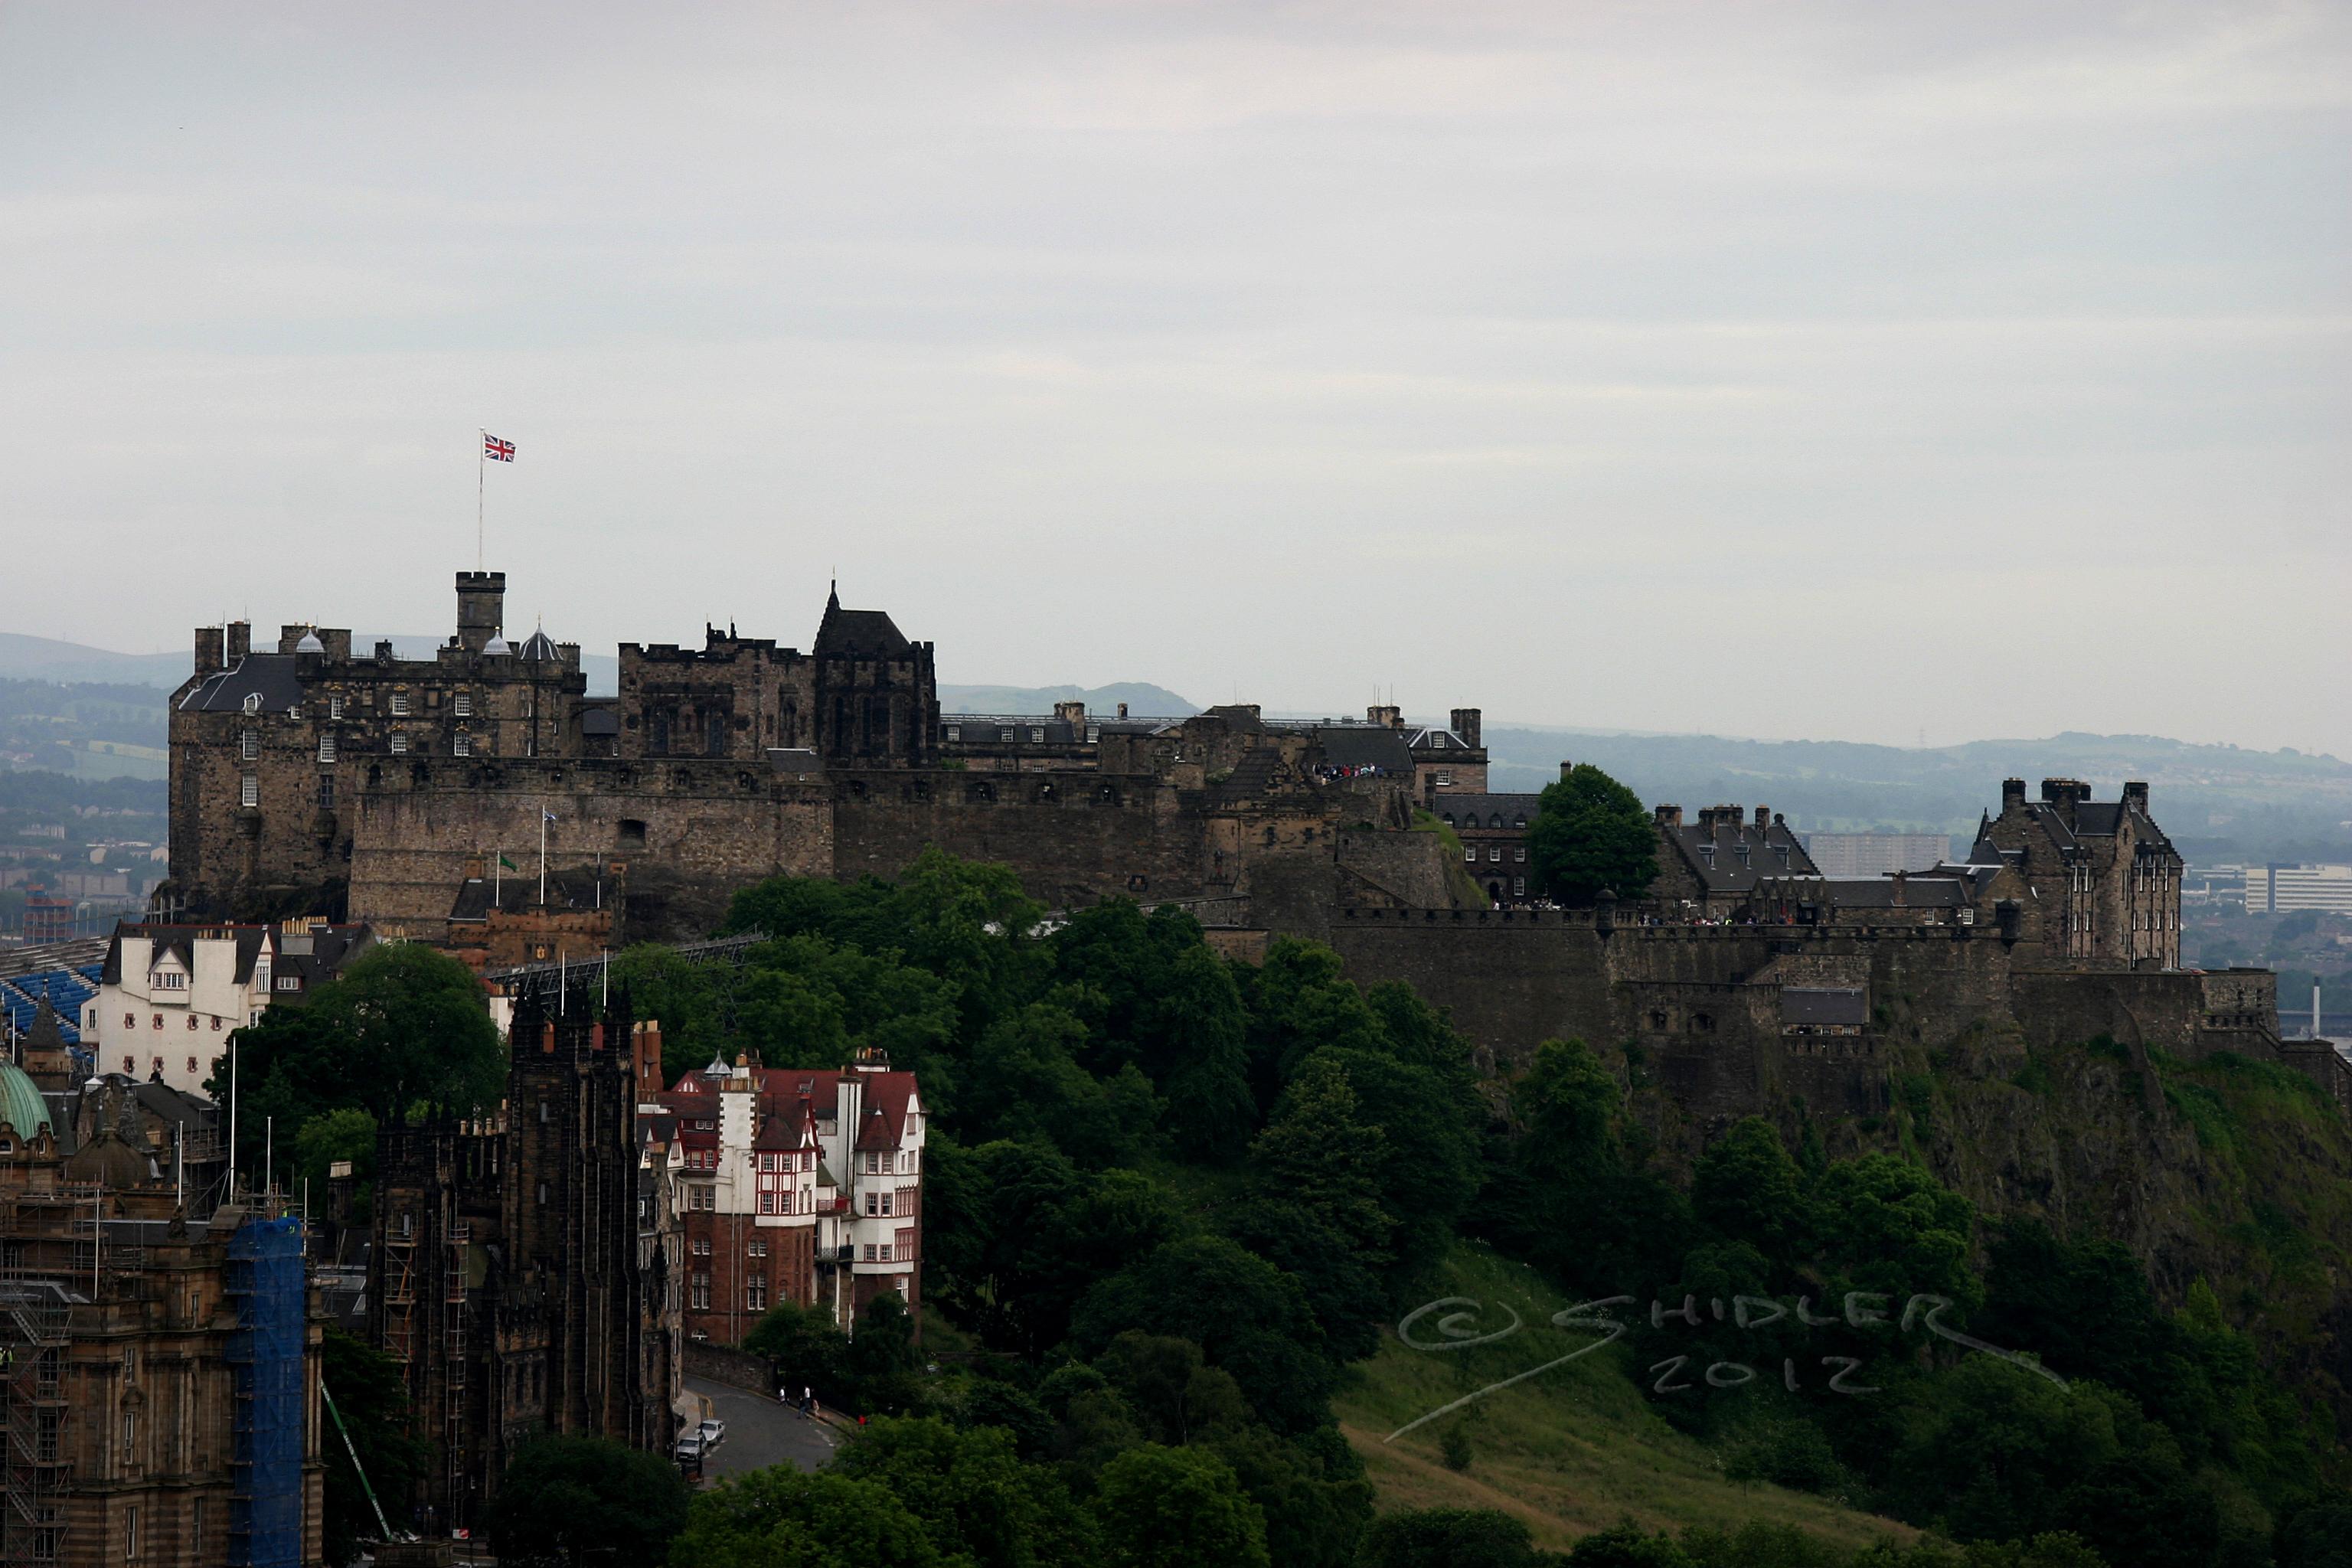 Castle Edinburgh by vikingjon